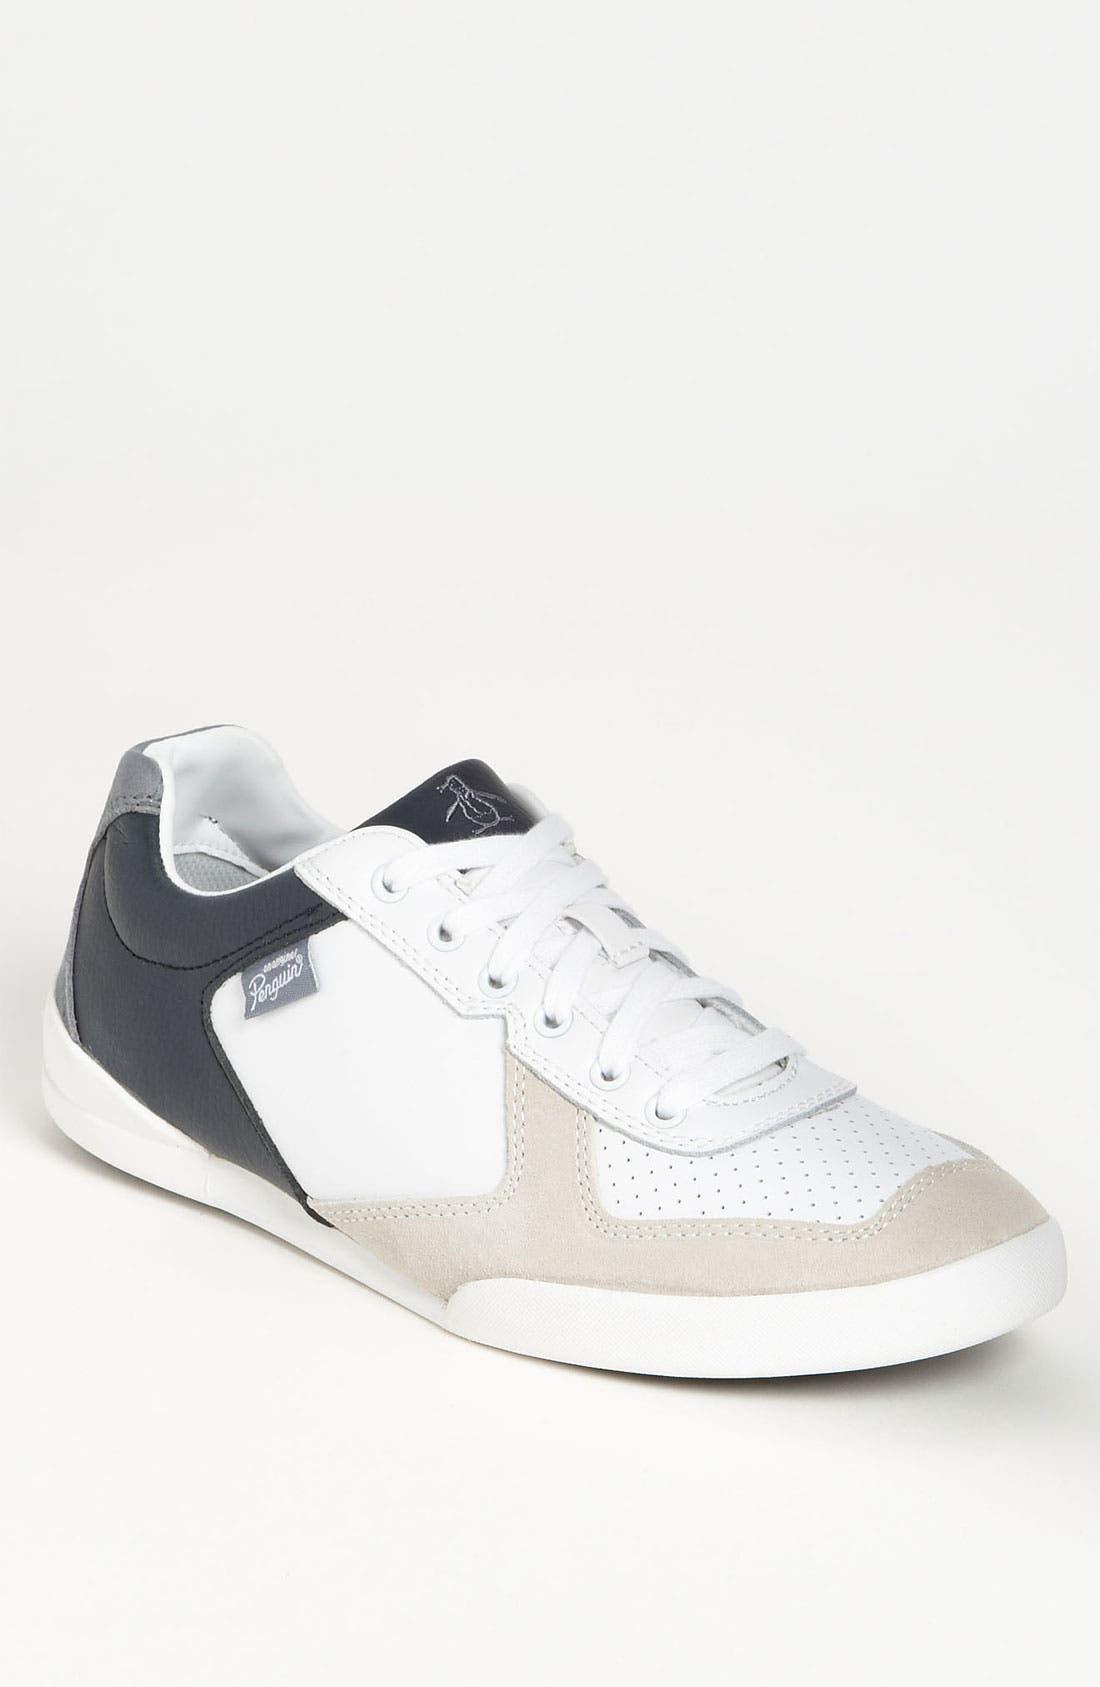 Main Image - Original Penguin 'Fandango' Sneaker